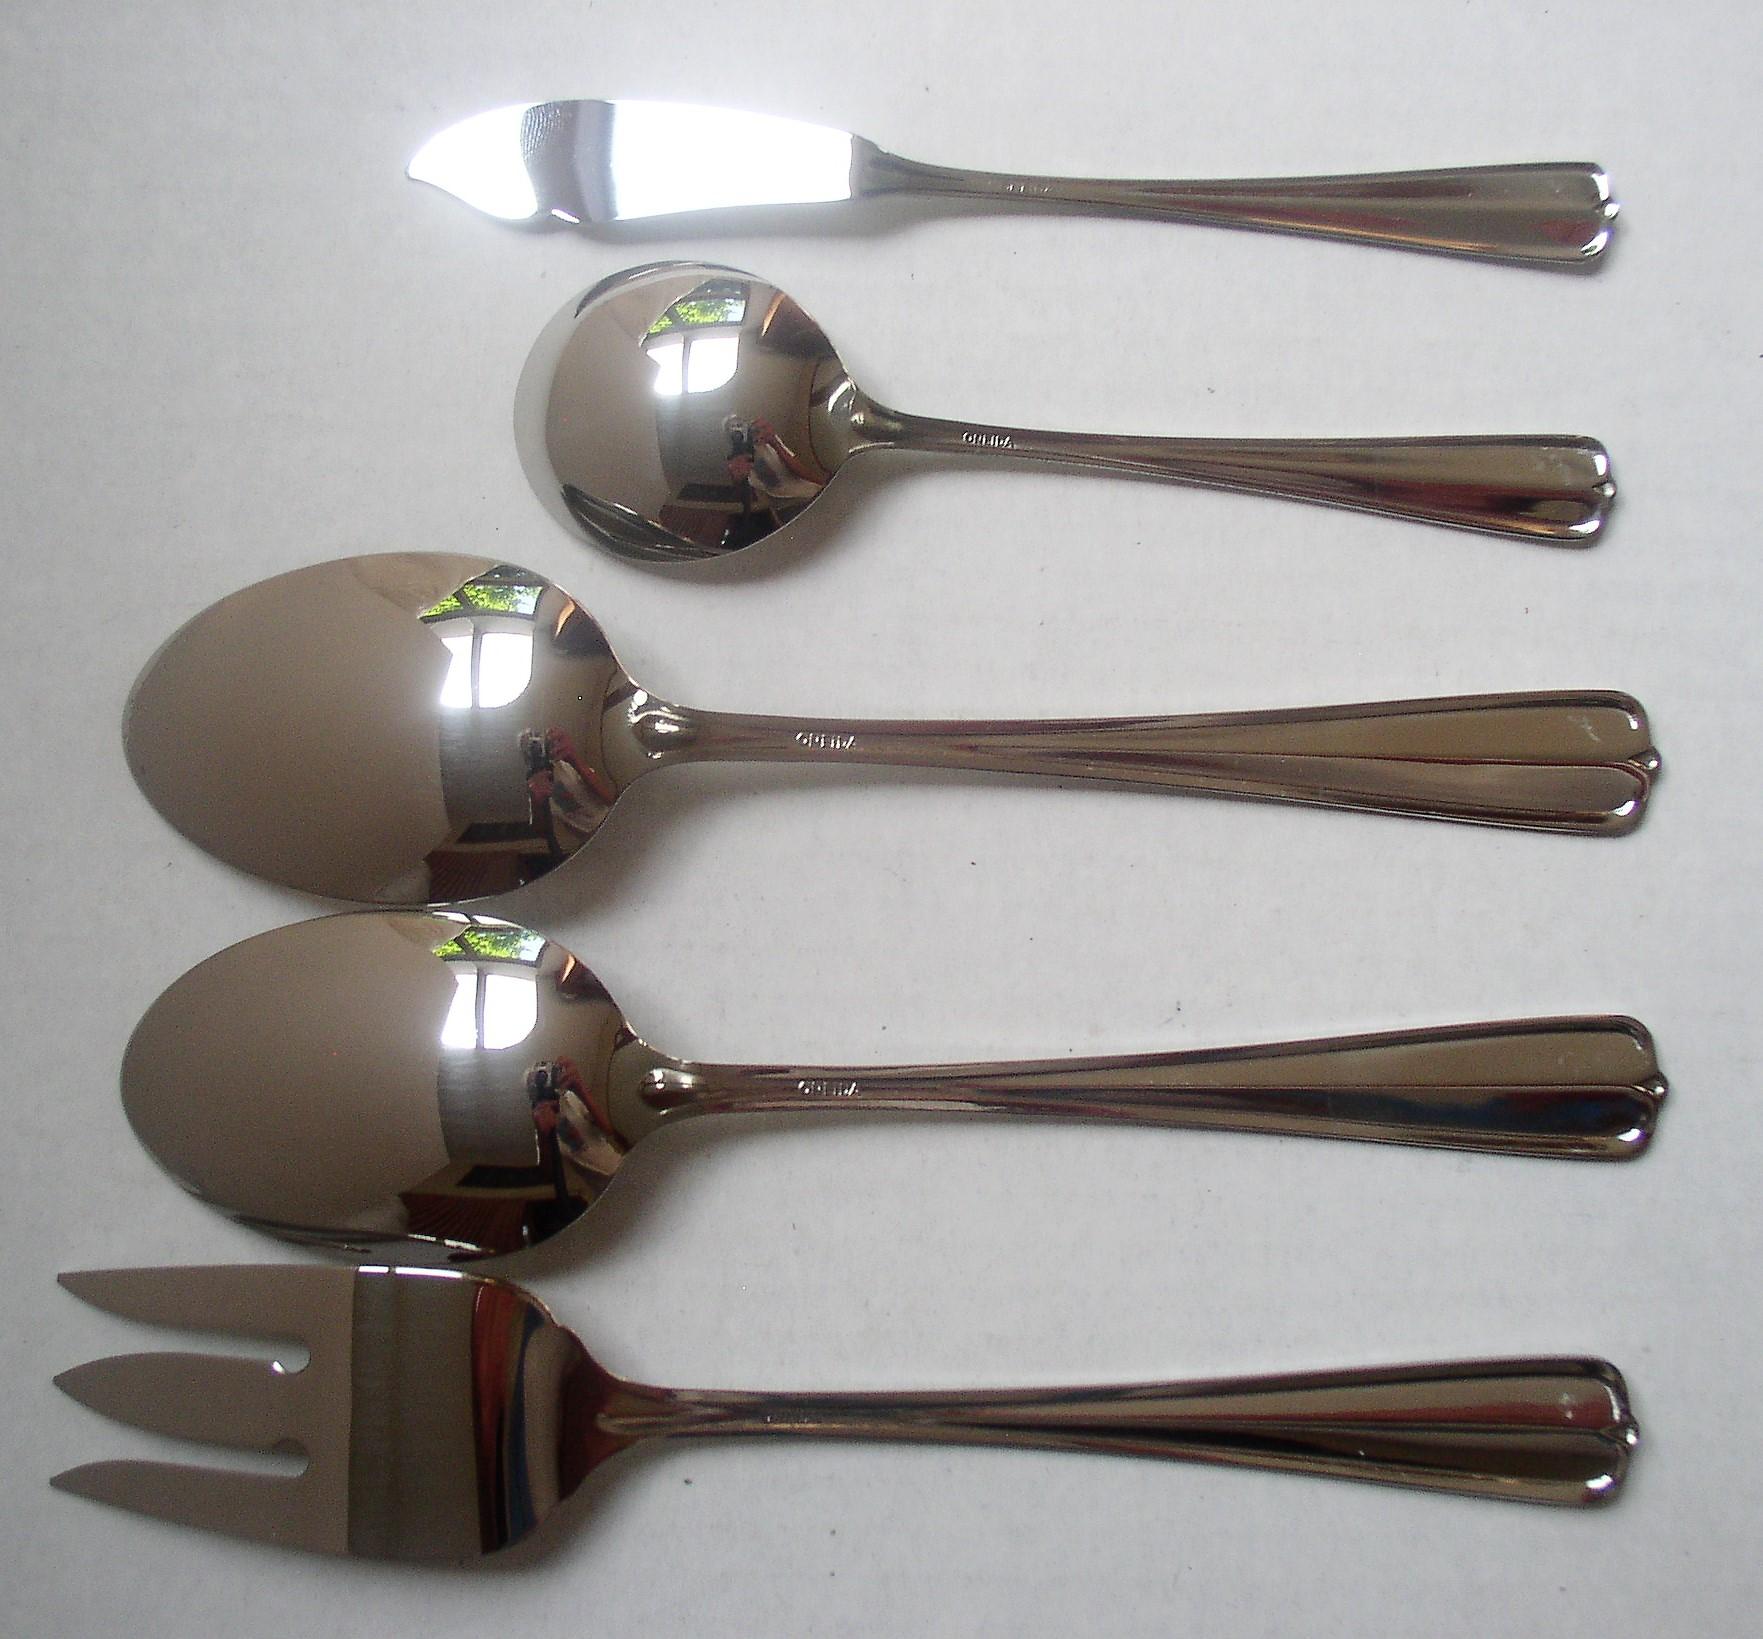 5 Oneida Gala Impulse Stainless Serving Pieces Unused Spoon Fork